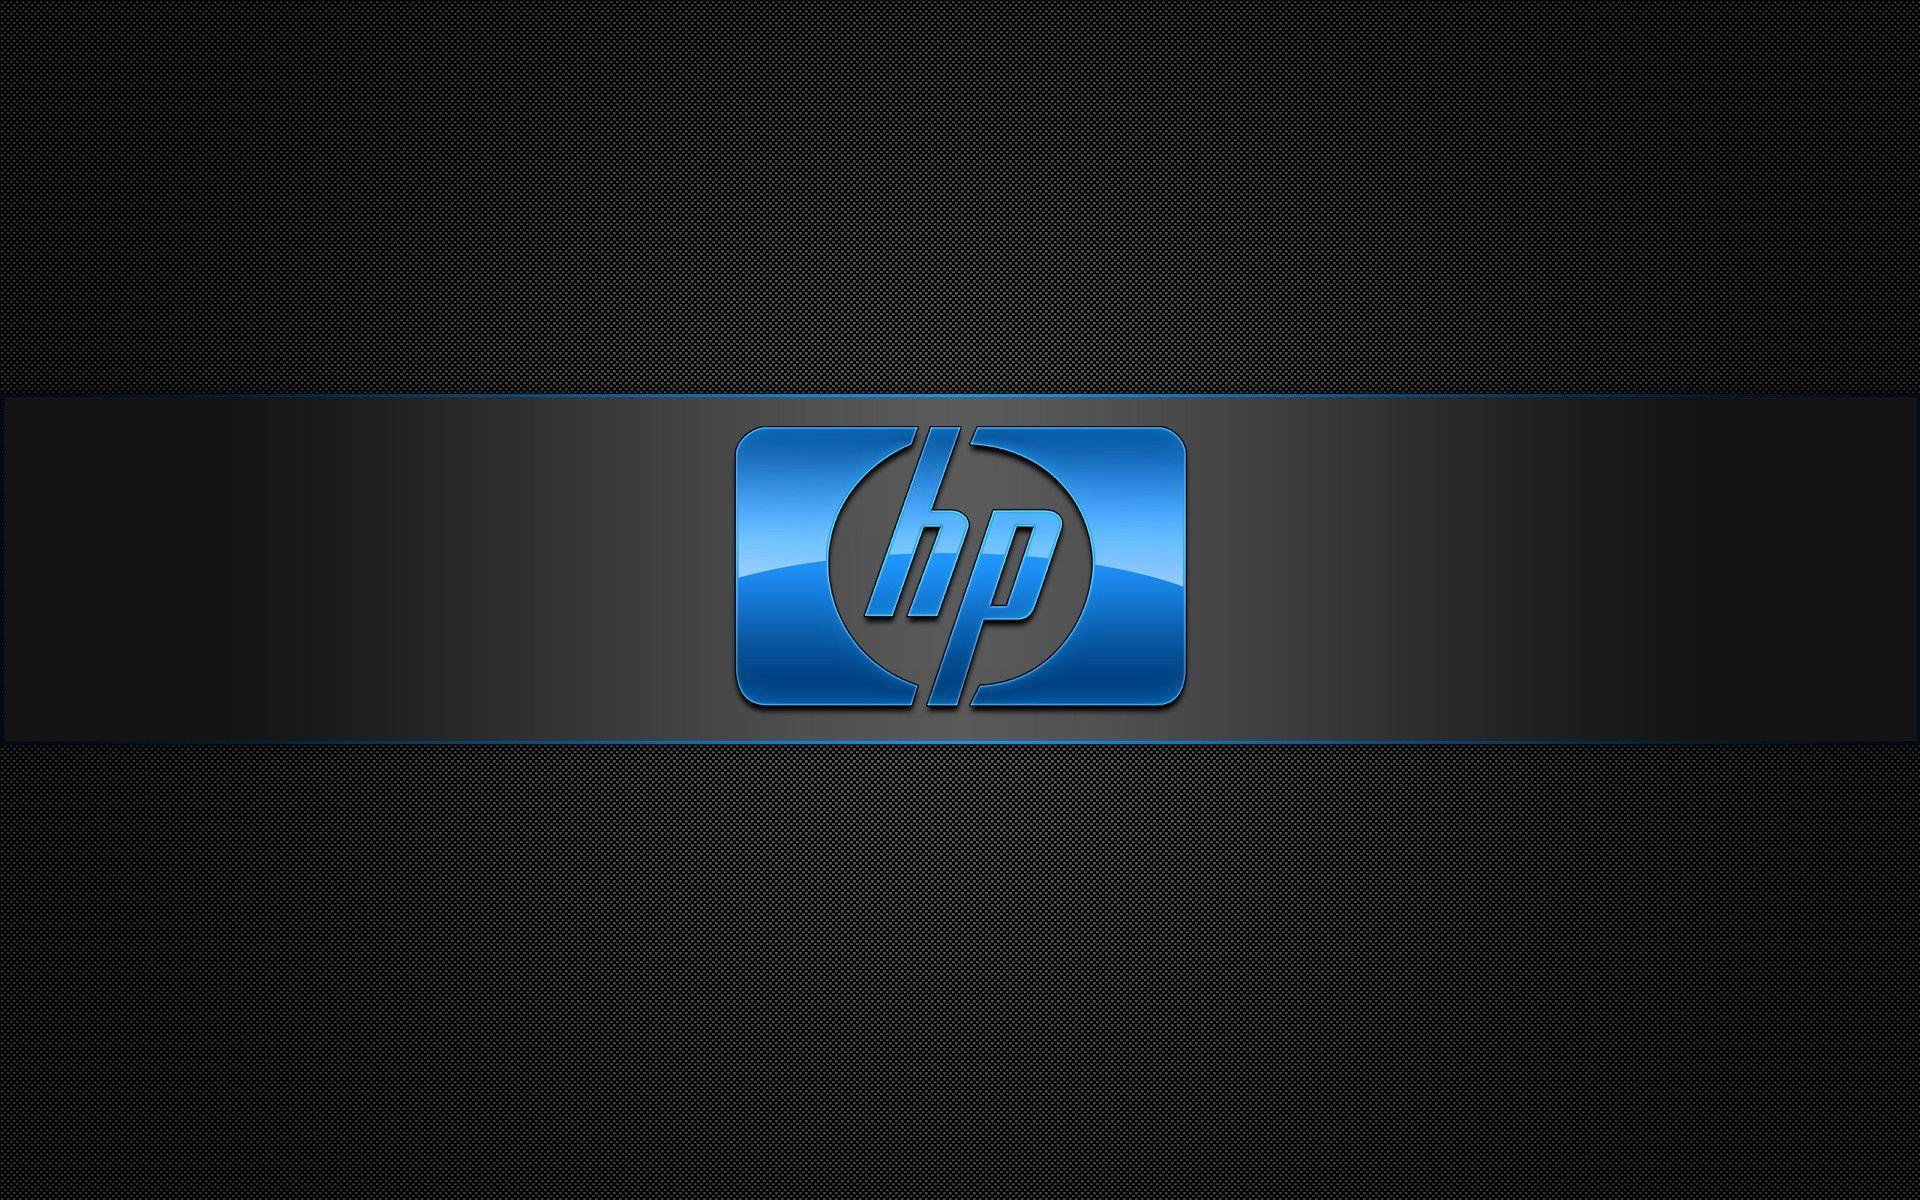 HD HP Wallpapers - Wallpaper Cave